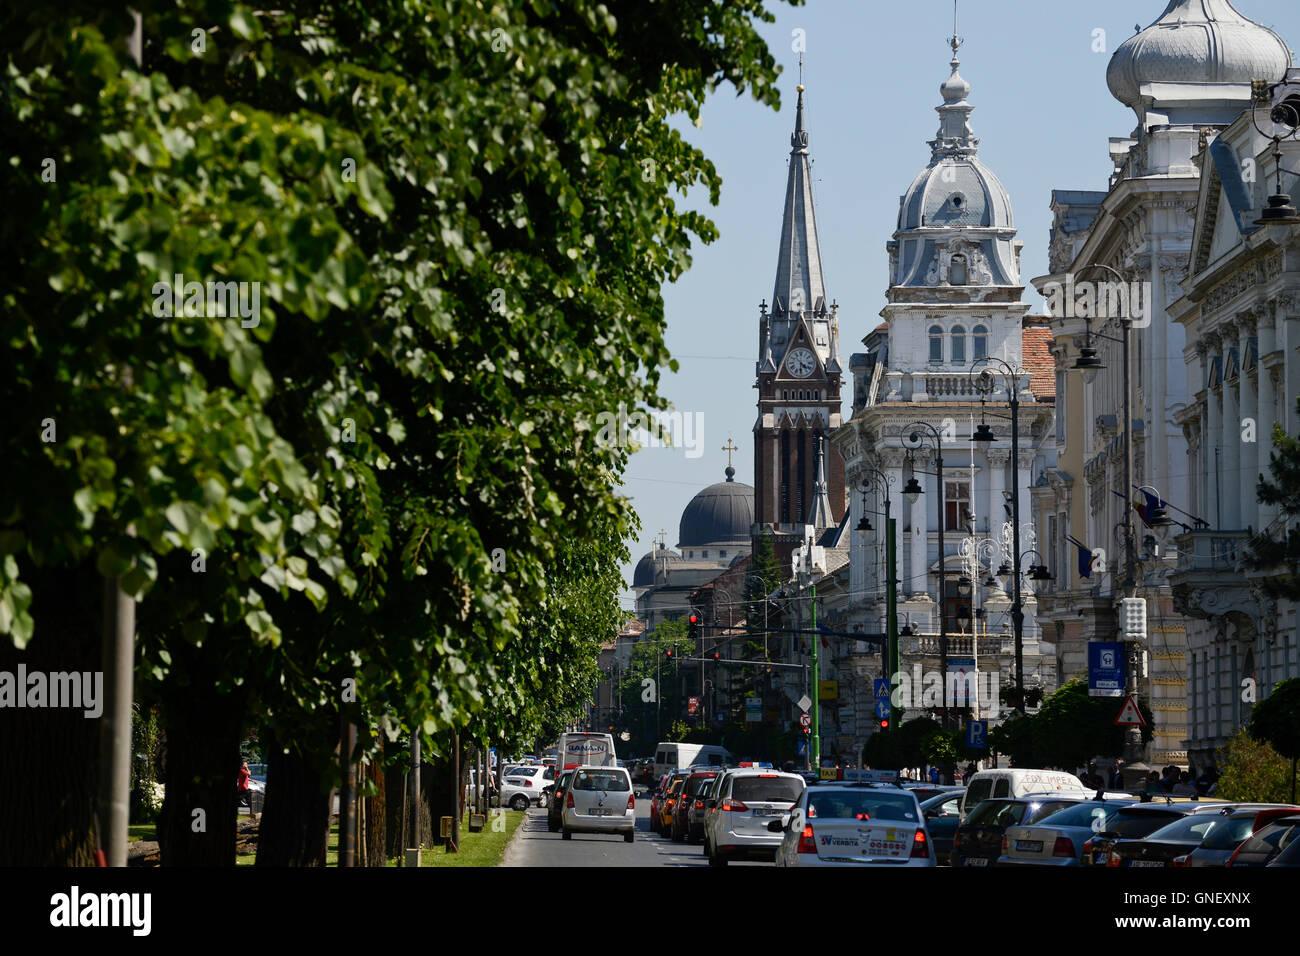 Arad Rumänien romania banat arad rumaenien banat arad stock photo royalty